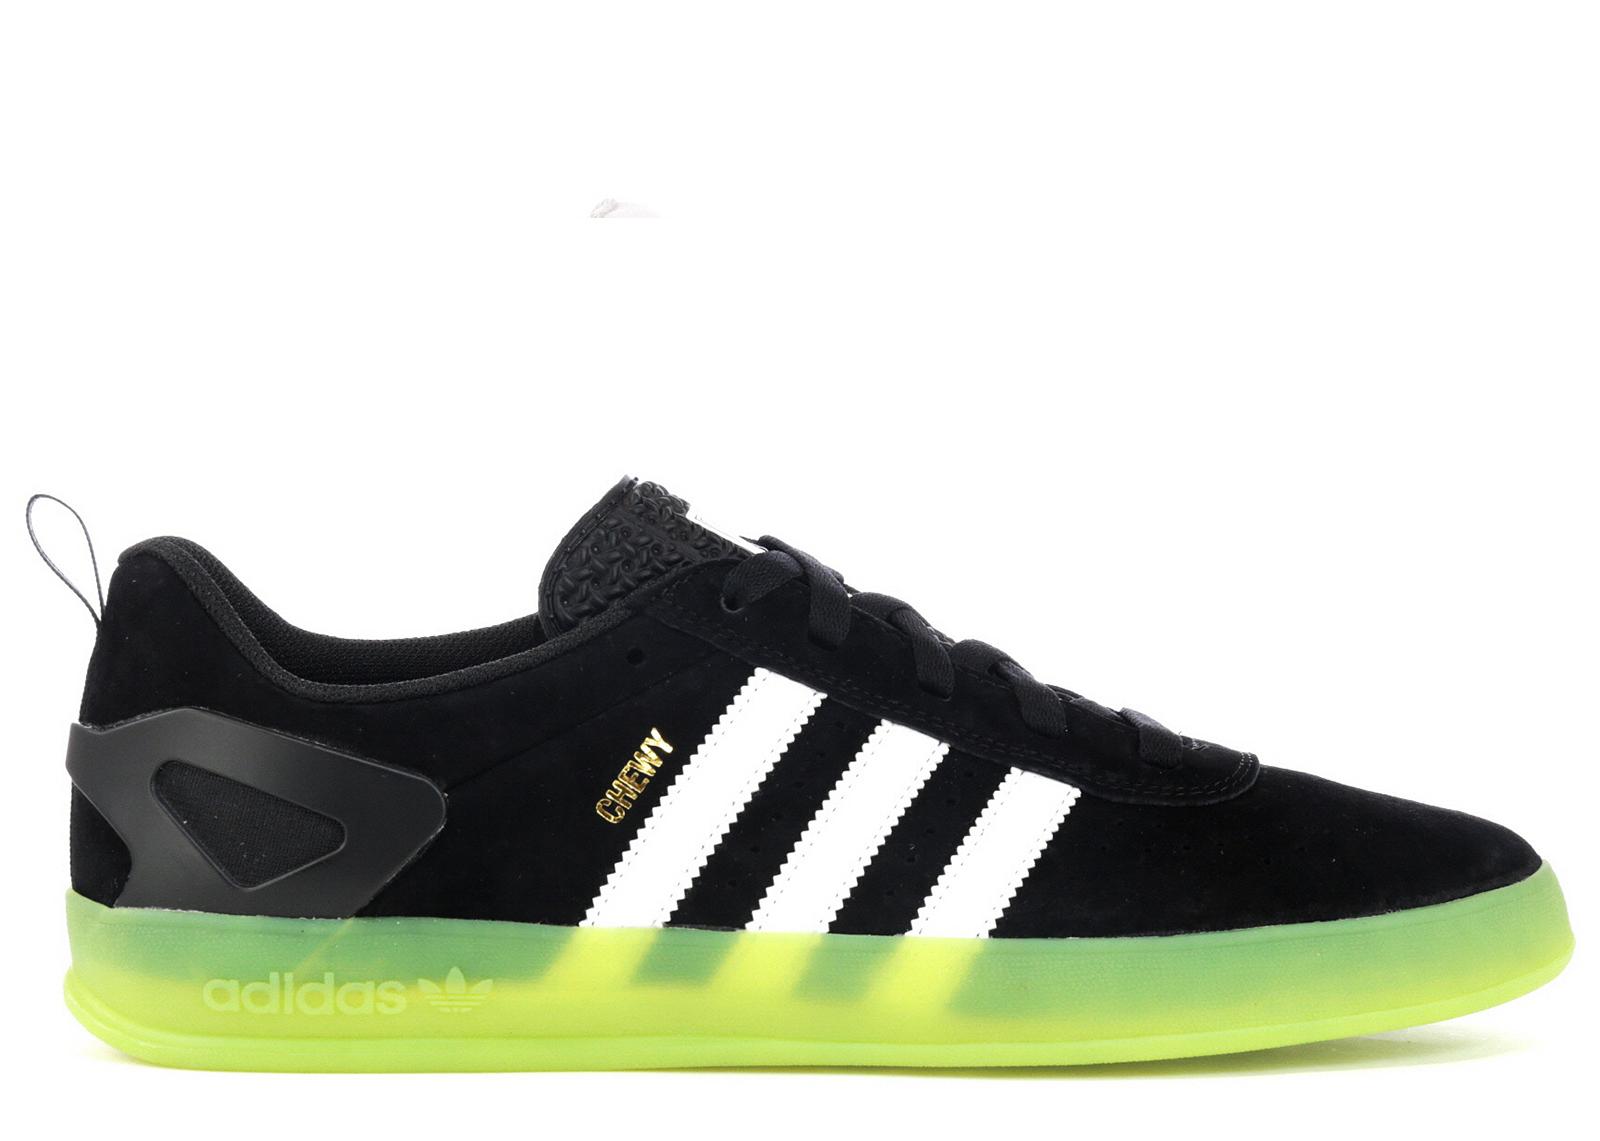 Adidas Palace Pro (Chewy Cannon) Shoe BlackWhiteGreen